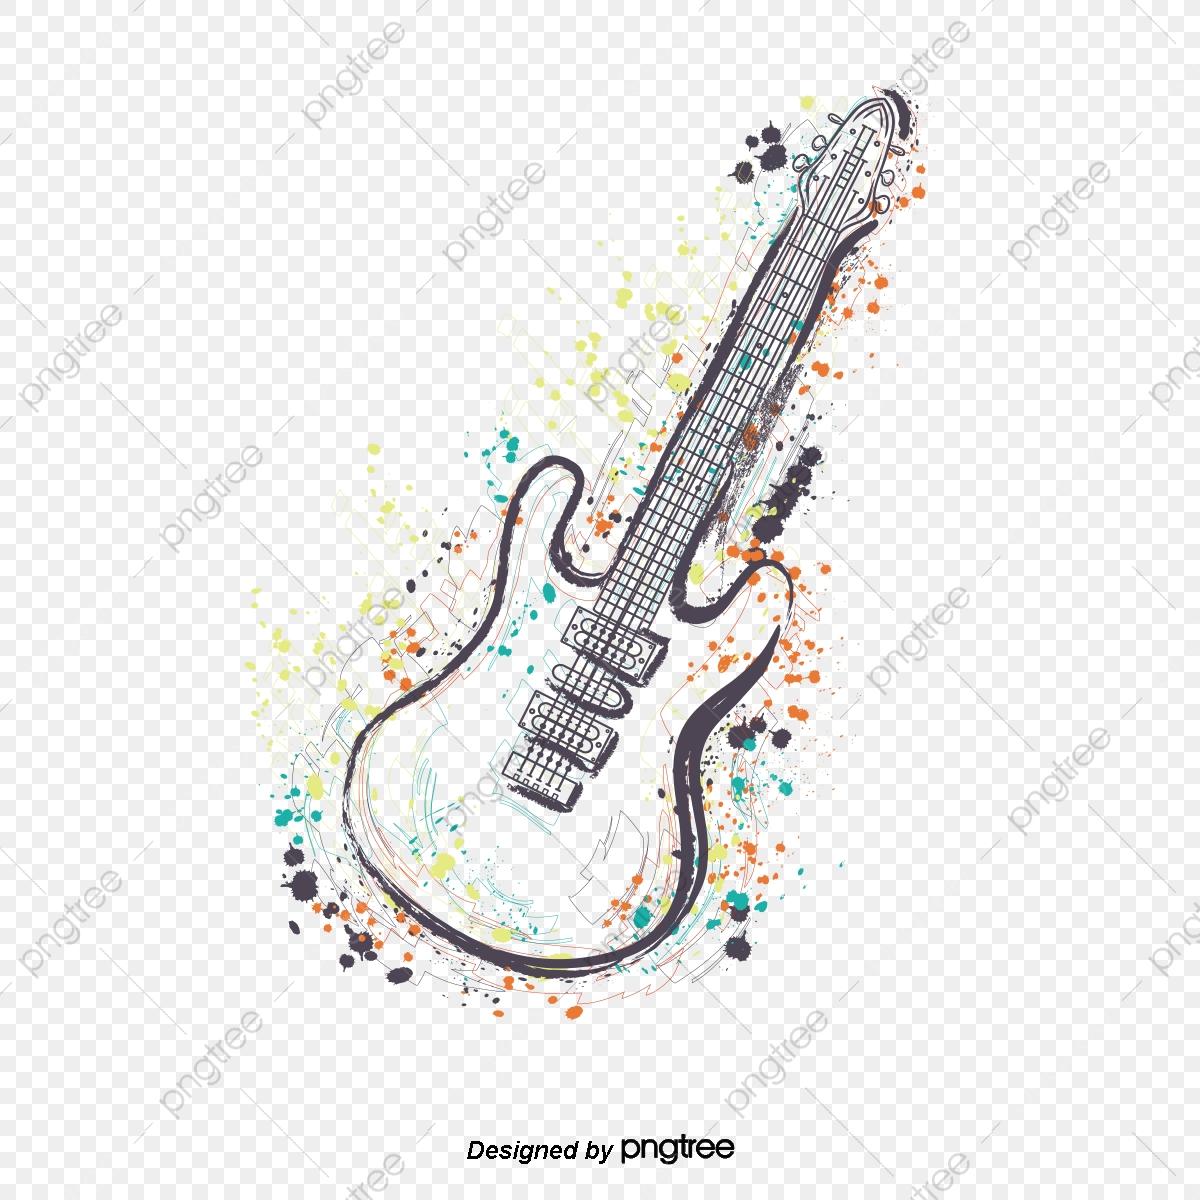 jpg library stock Vector color guitar. Art png